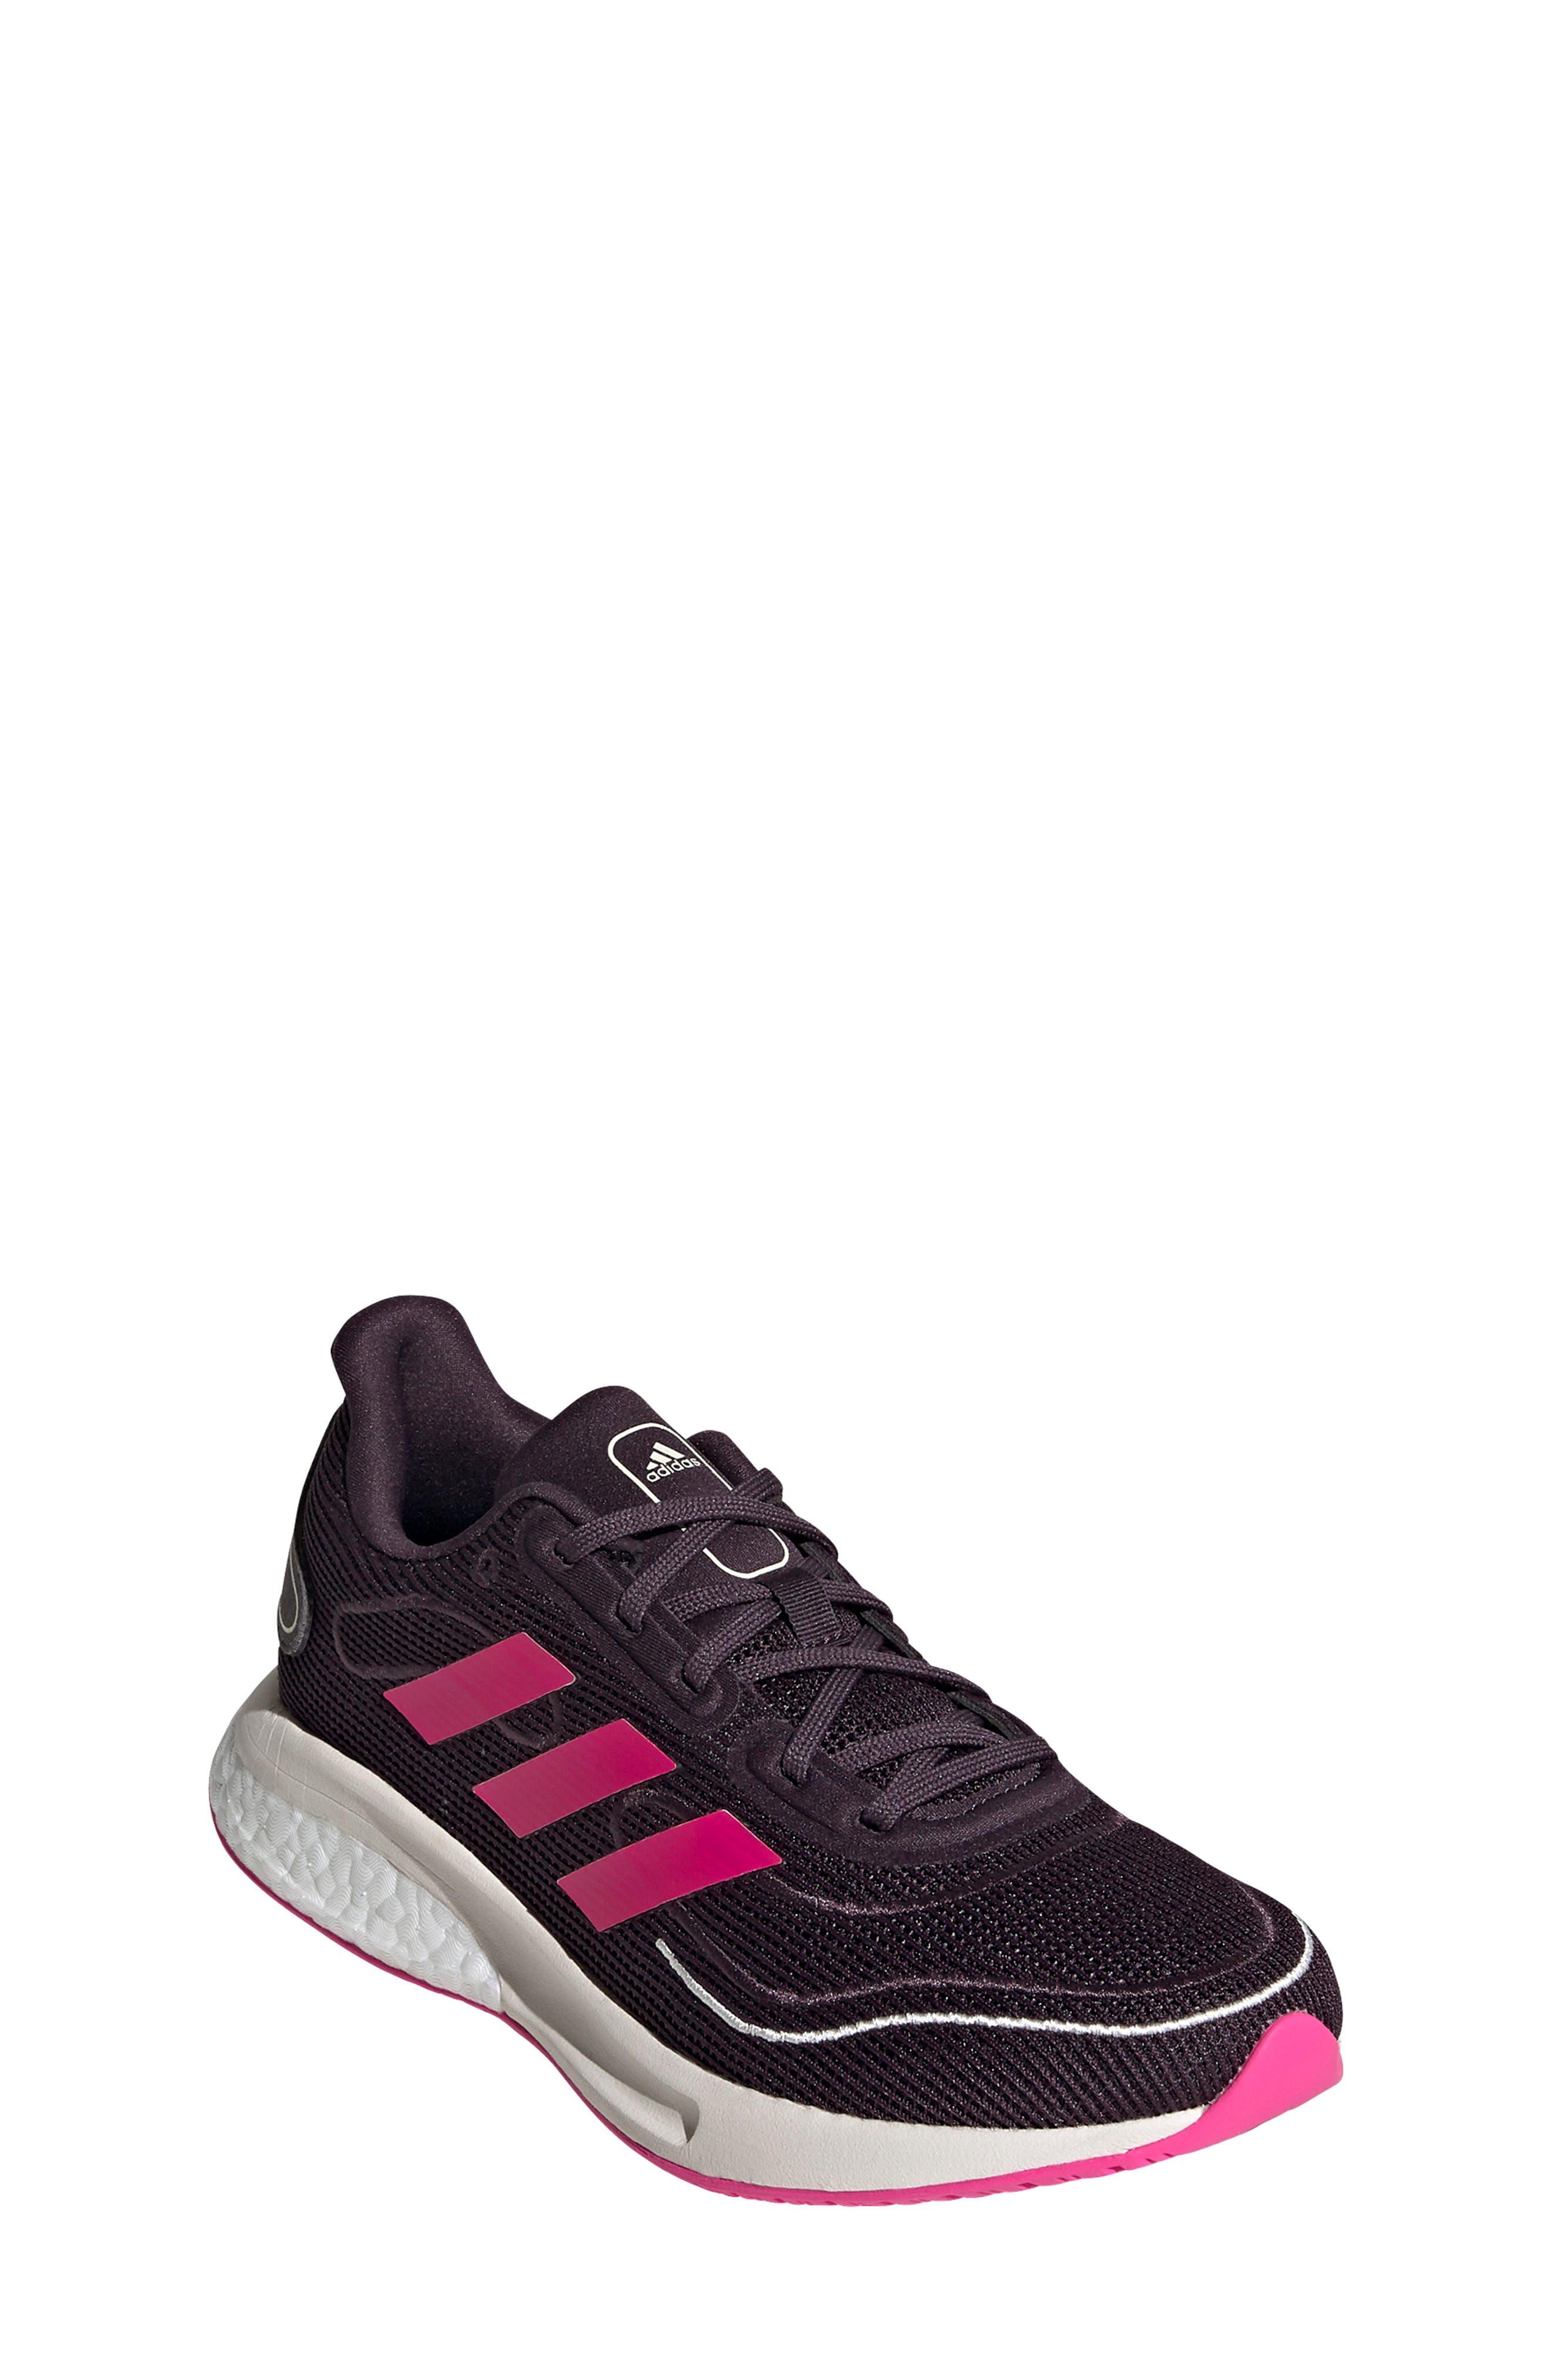 Adidas Supernova J Running Shoe (Big Kid) | Nordstrom